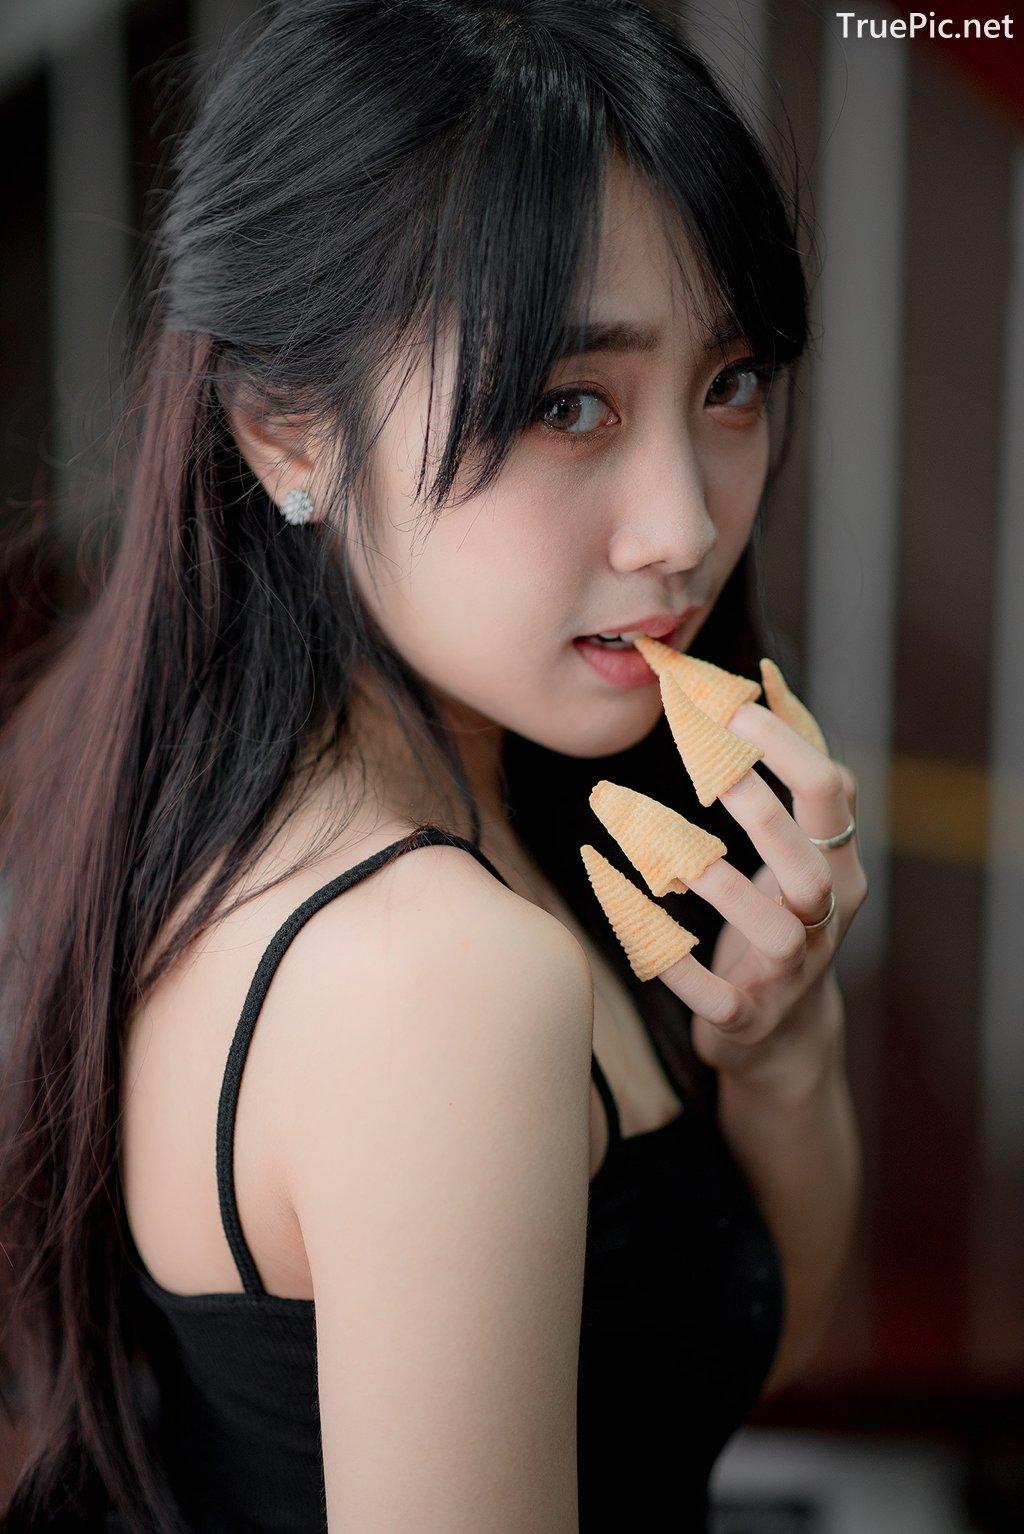 Image Thailand Model - Suneta Ngachalvy - Black Crop Top - TruePic.net - Picture-9